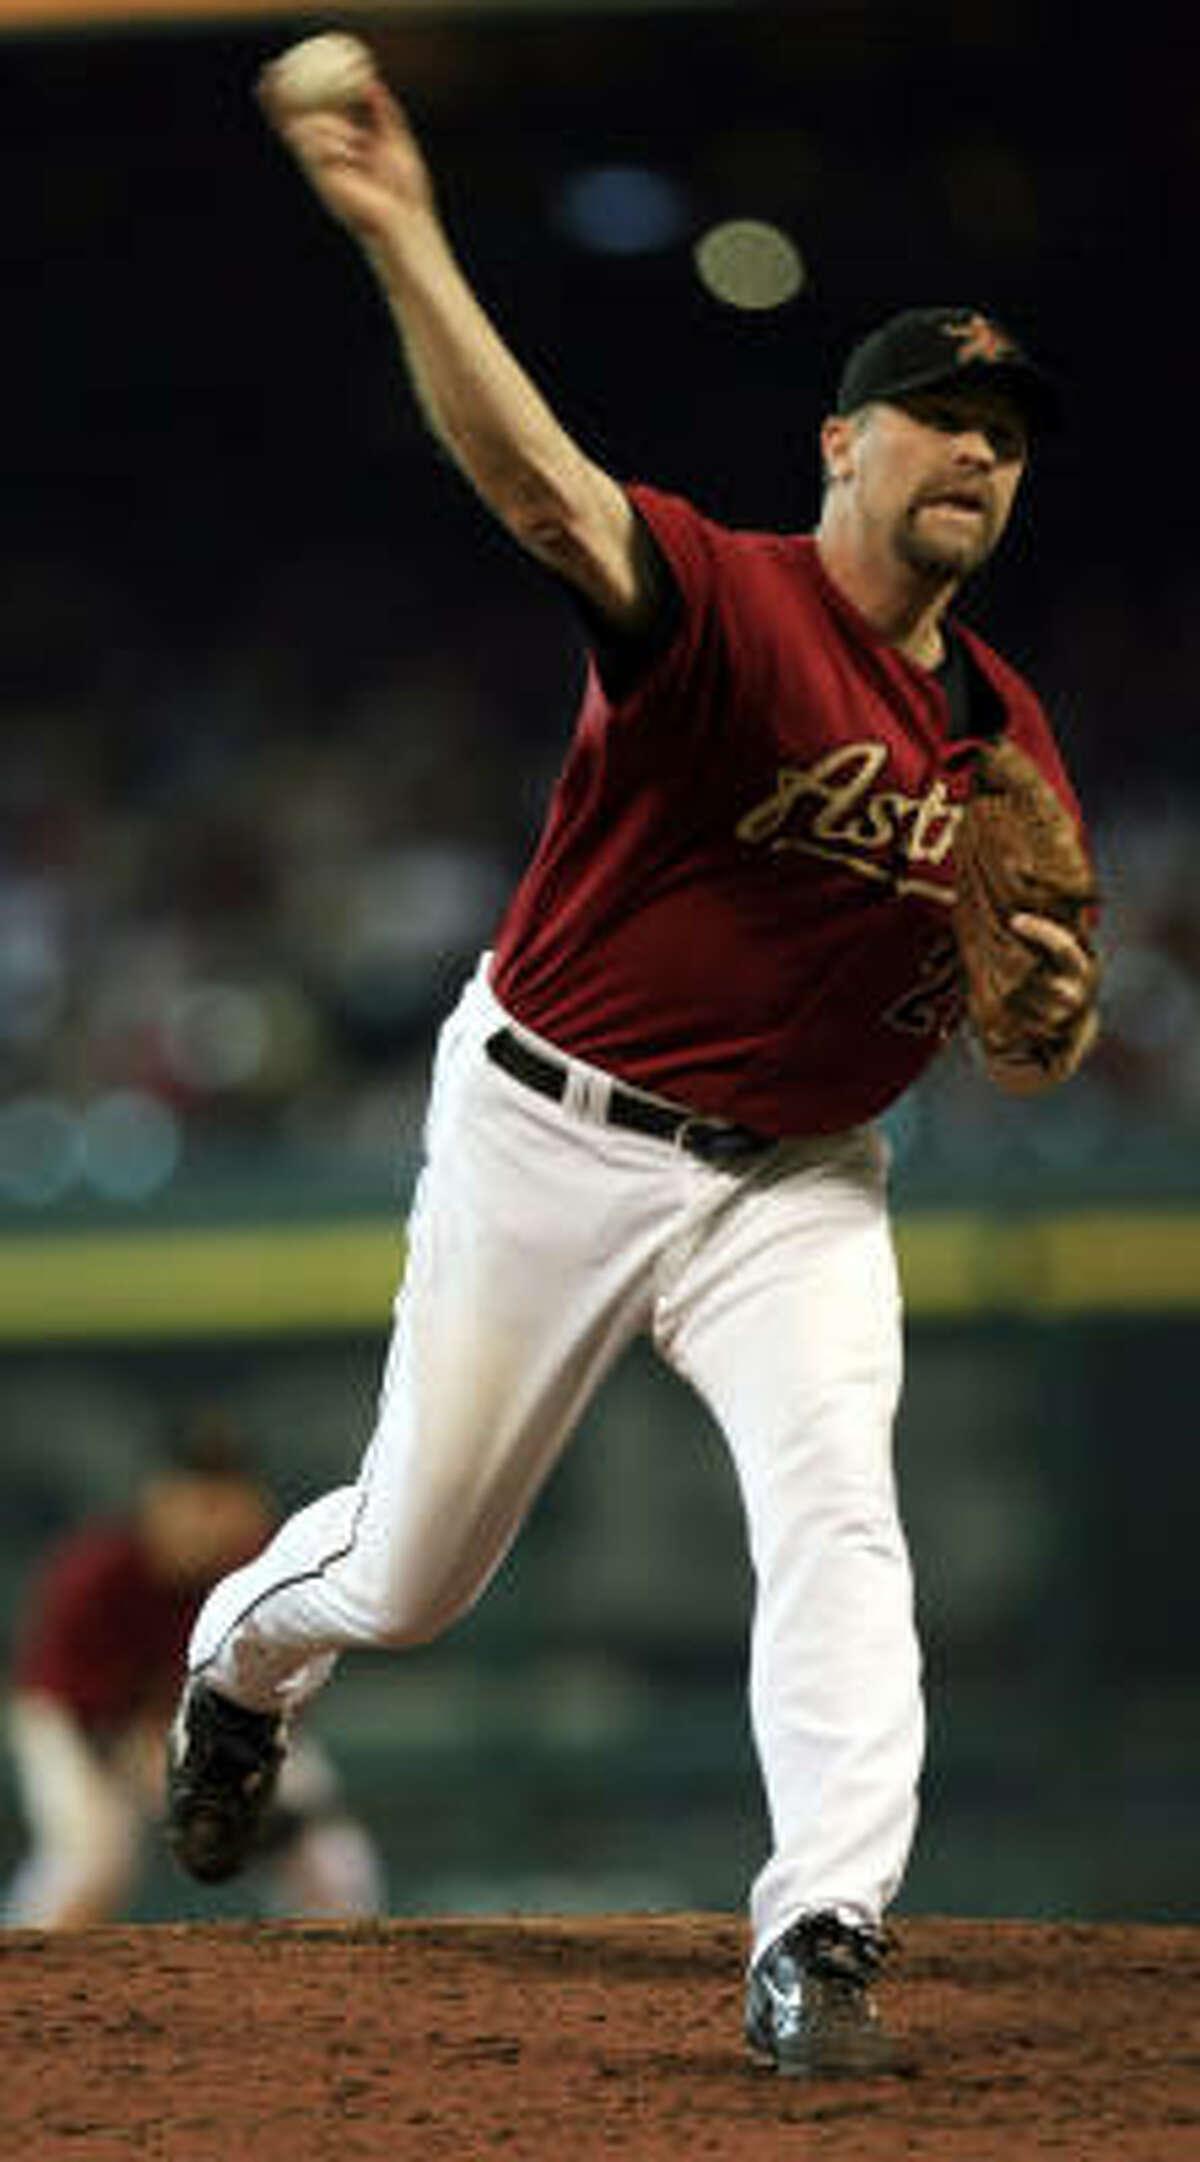 Doug Brocail will be back in the Astros bullpen for the 2009 season.